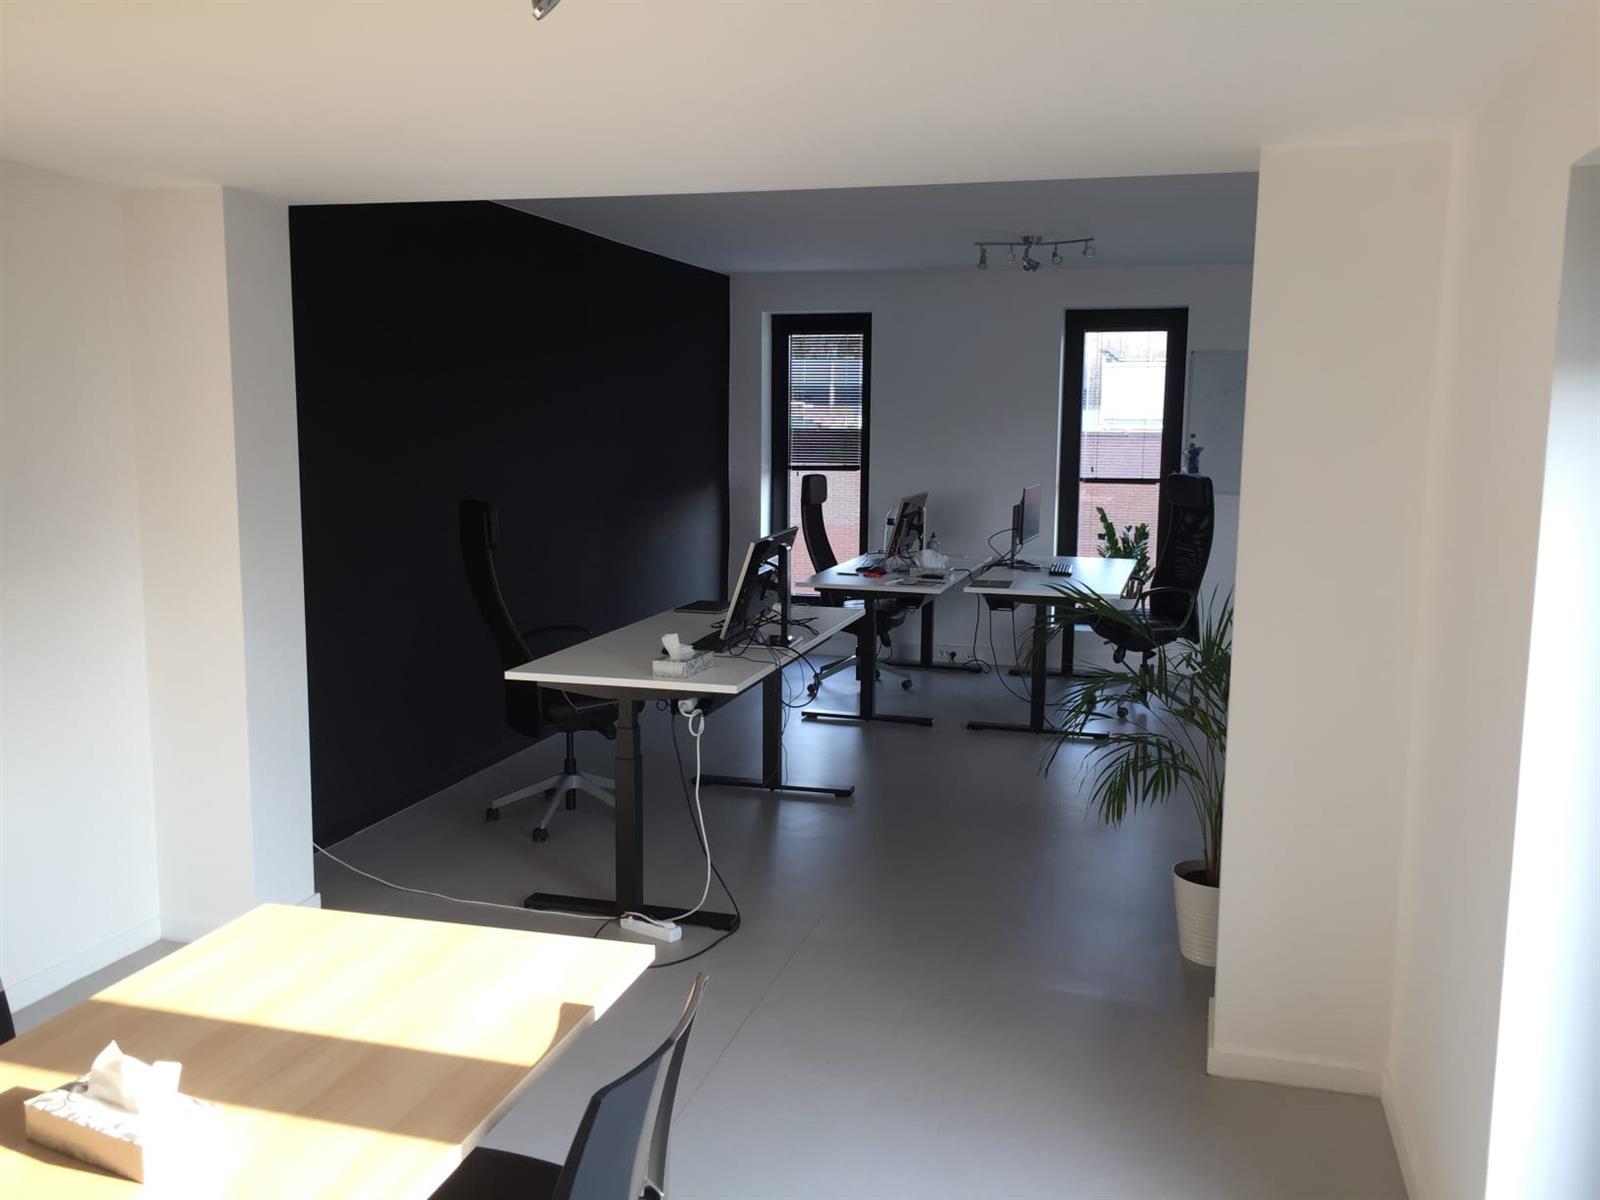 kantoor te huur K003 - Middelmolenlaan 96, 2100 Antwerpen Deurne, België 17